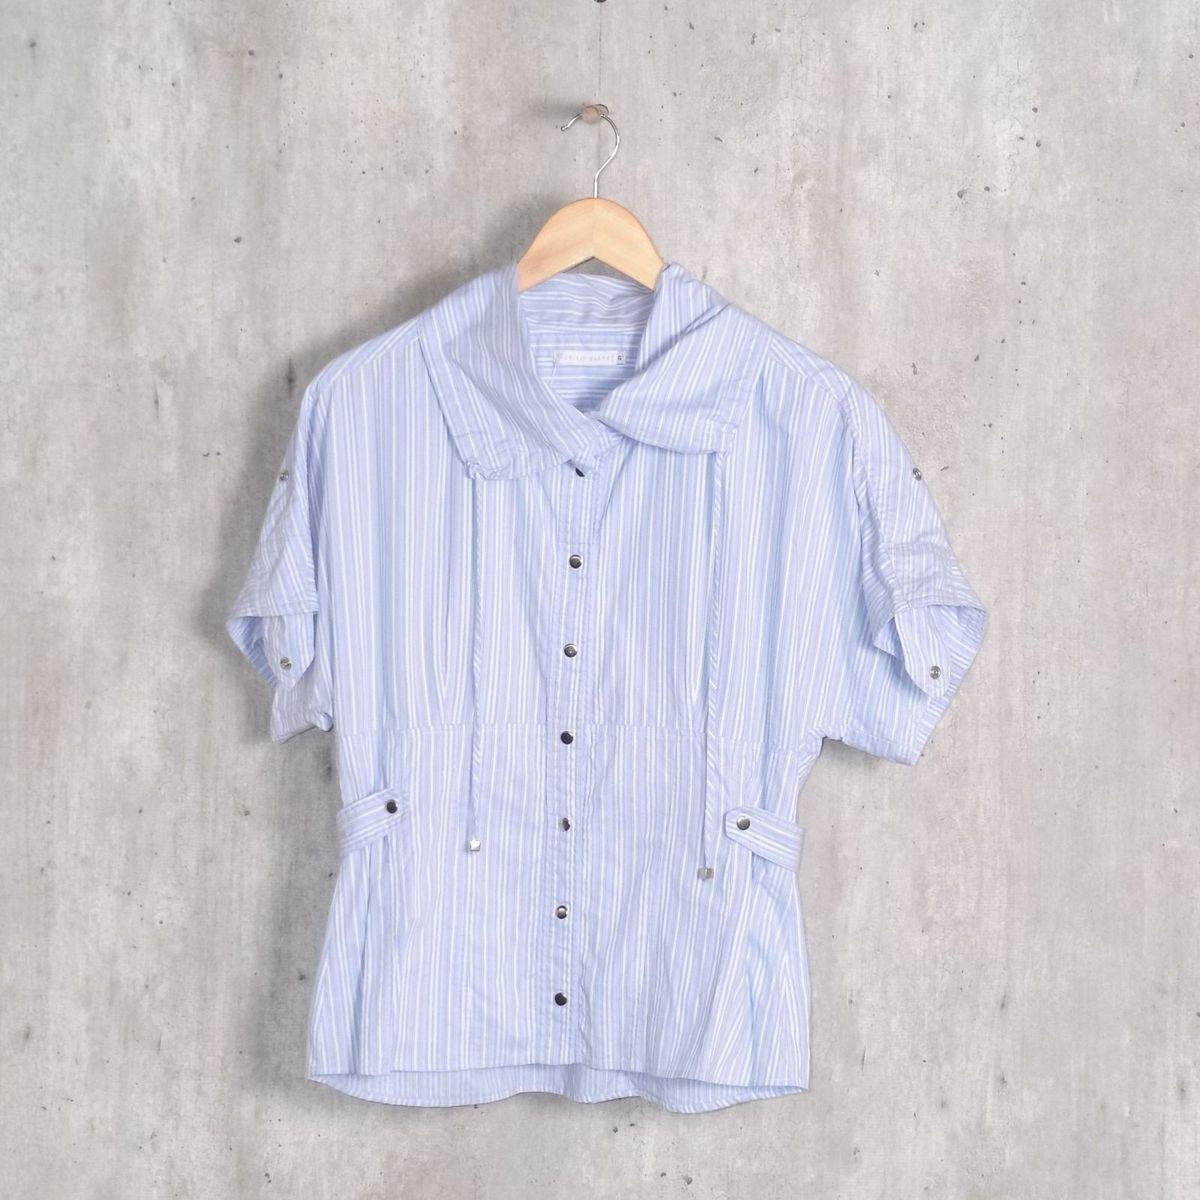 ecf02b804 Camisa Azul Listrada Le Lis Blanc